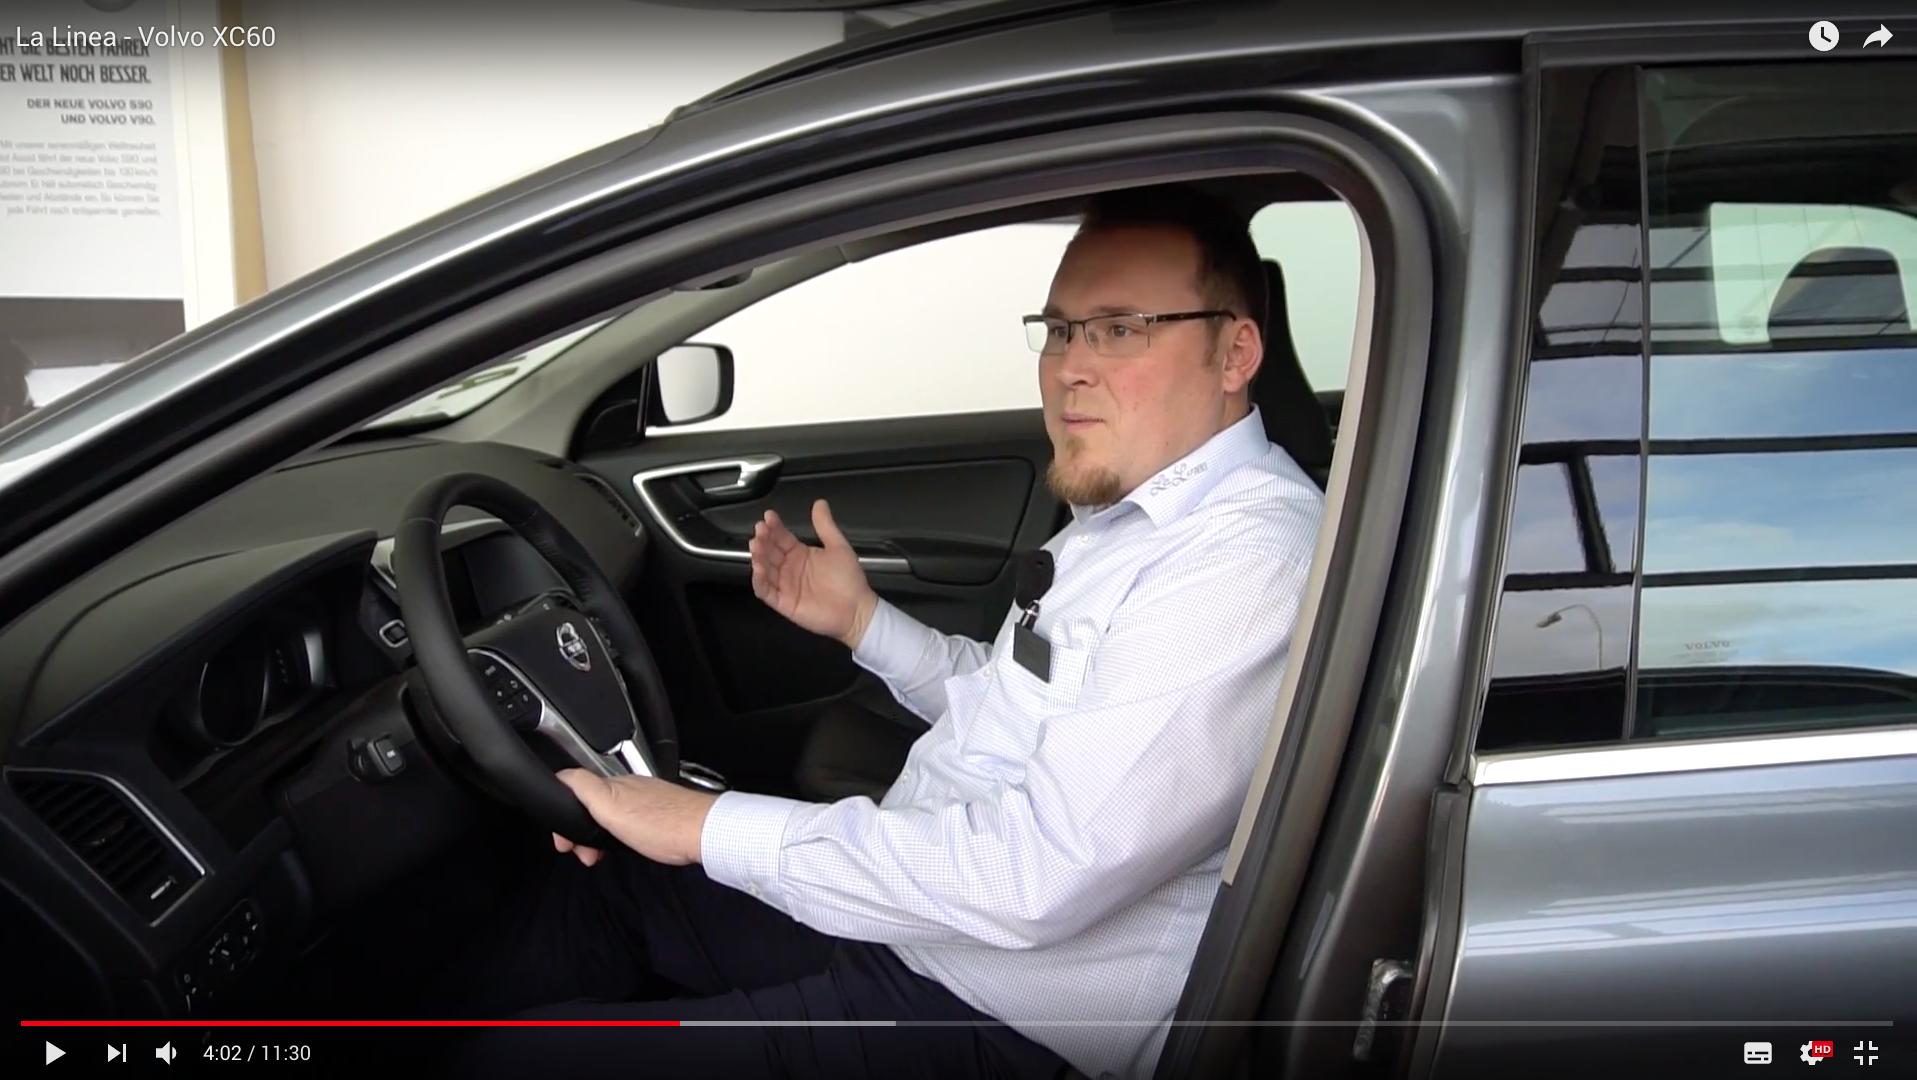 2017 La Linea - Volvo XC60_Kundenberater_im_Auto_MSM_MEDIEN_SAAR_MOSEL_SAARLAND_FERNSEHEN_1_ED_SAAR